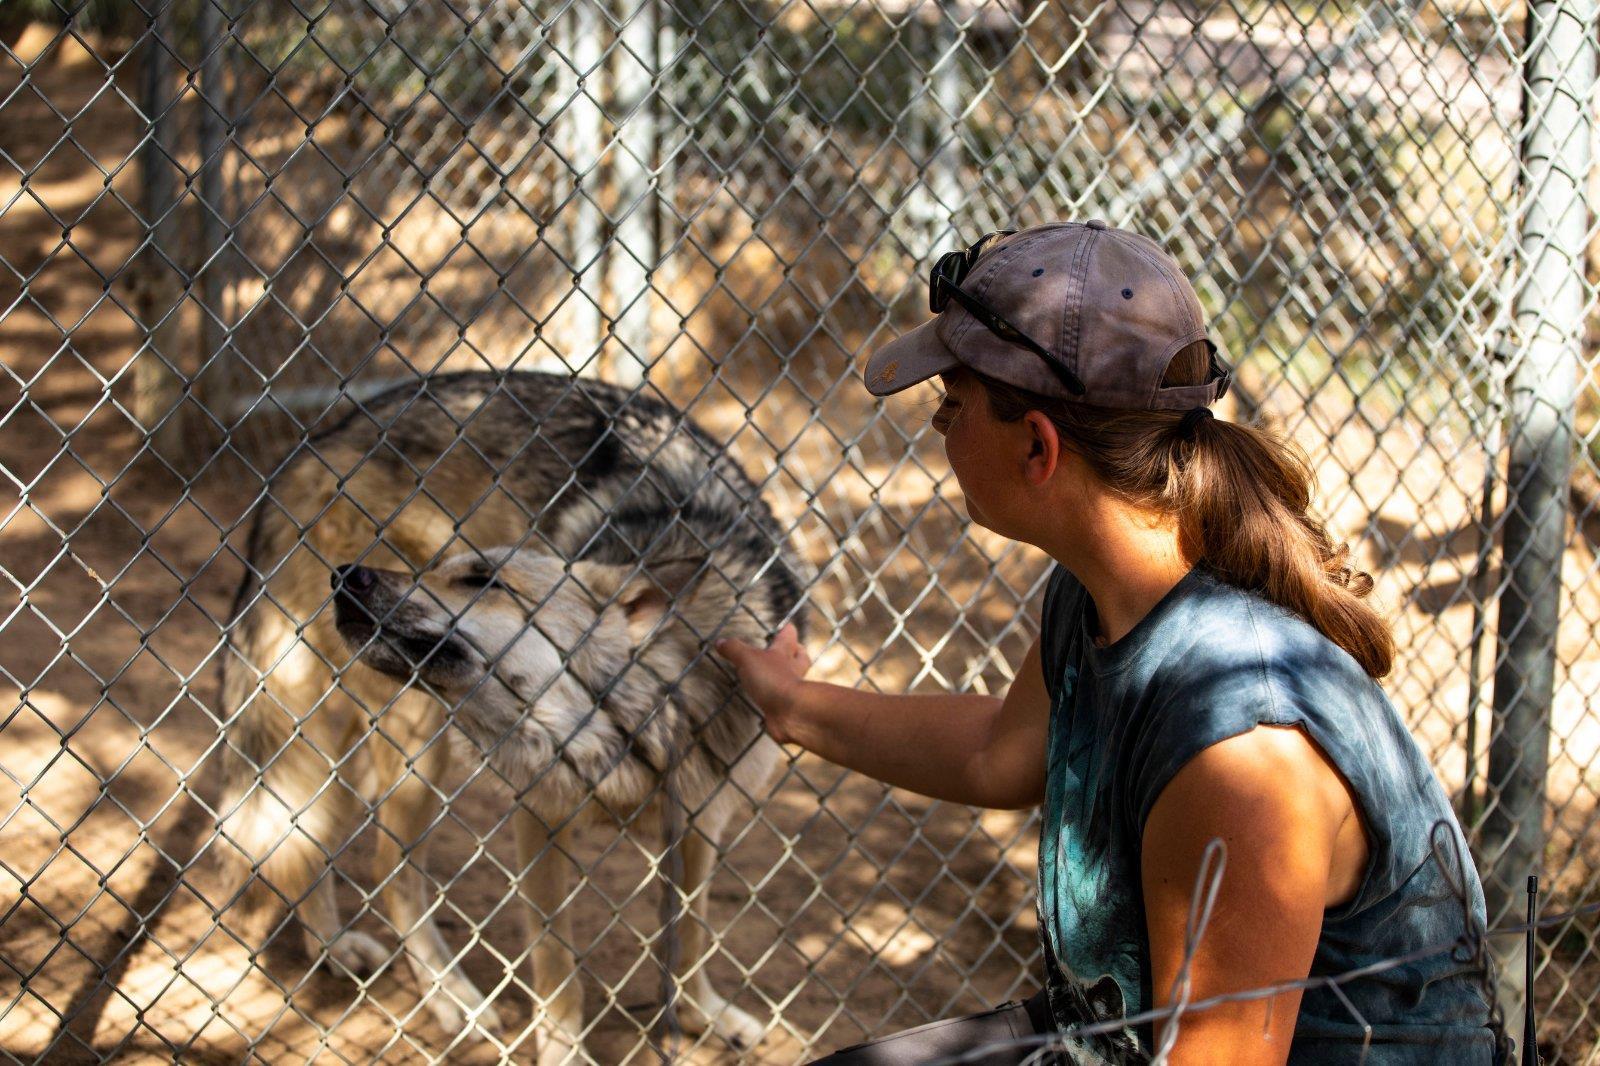 Grants, New Mexico - wolf sanctuary